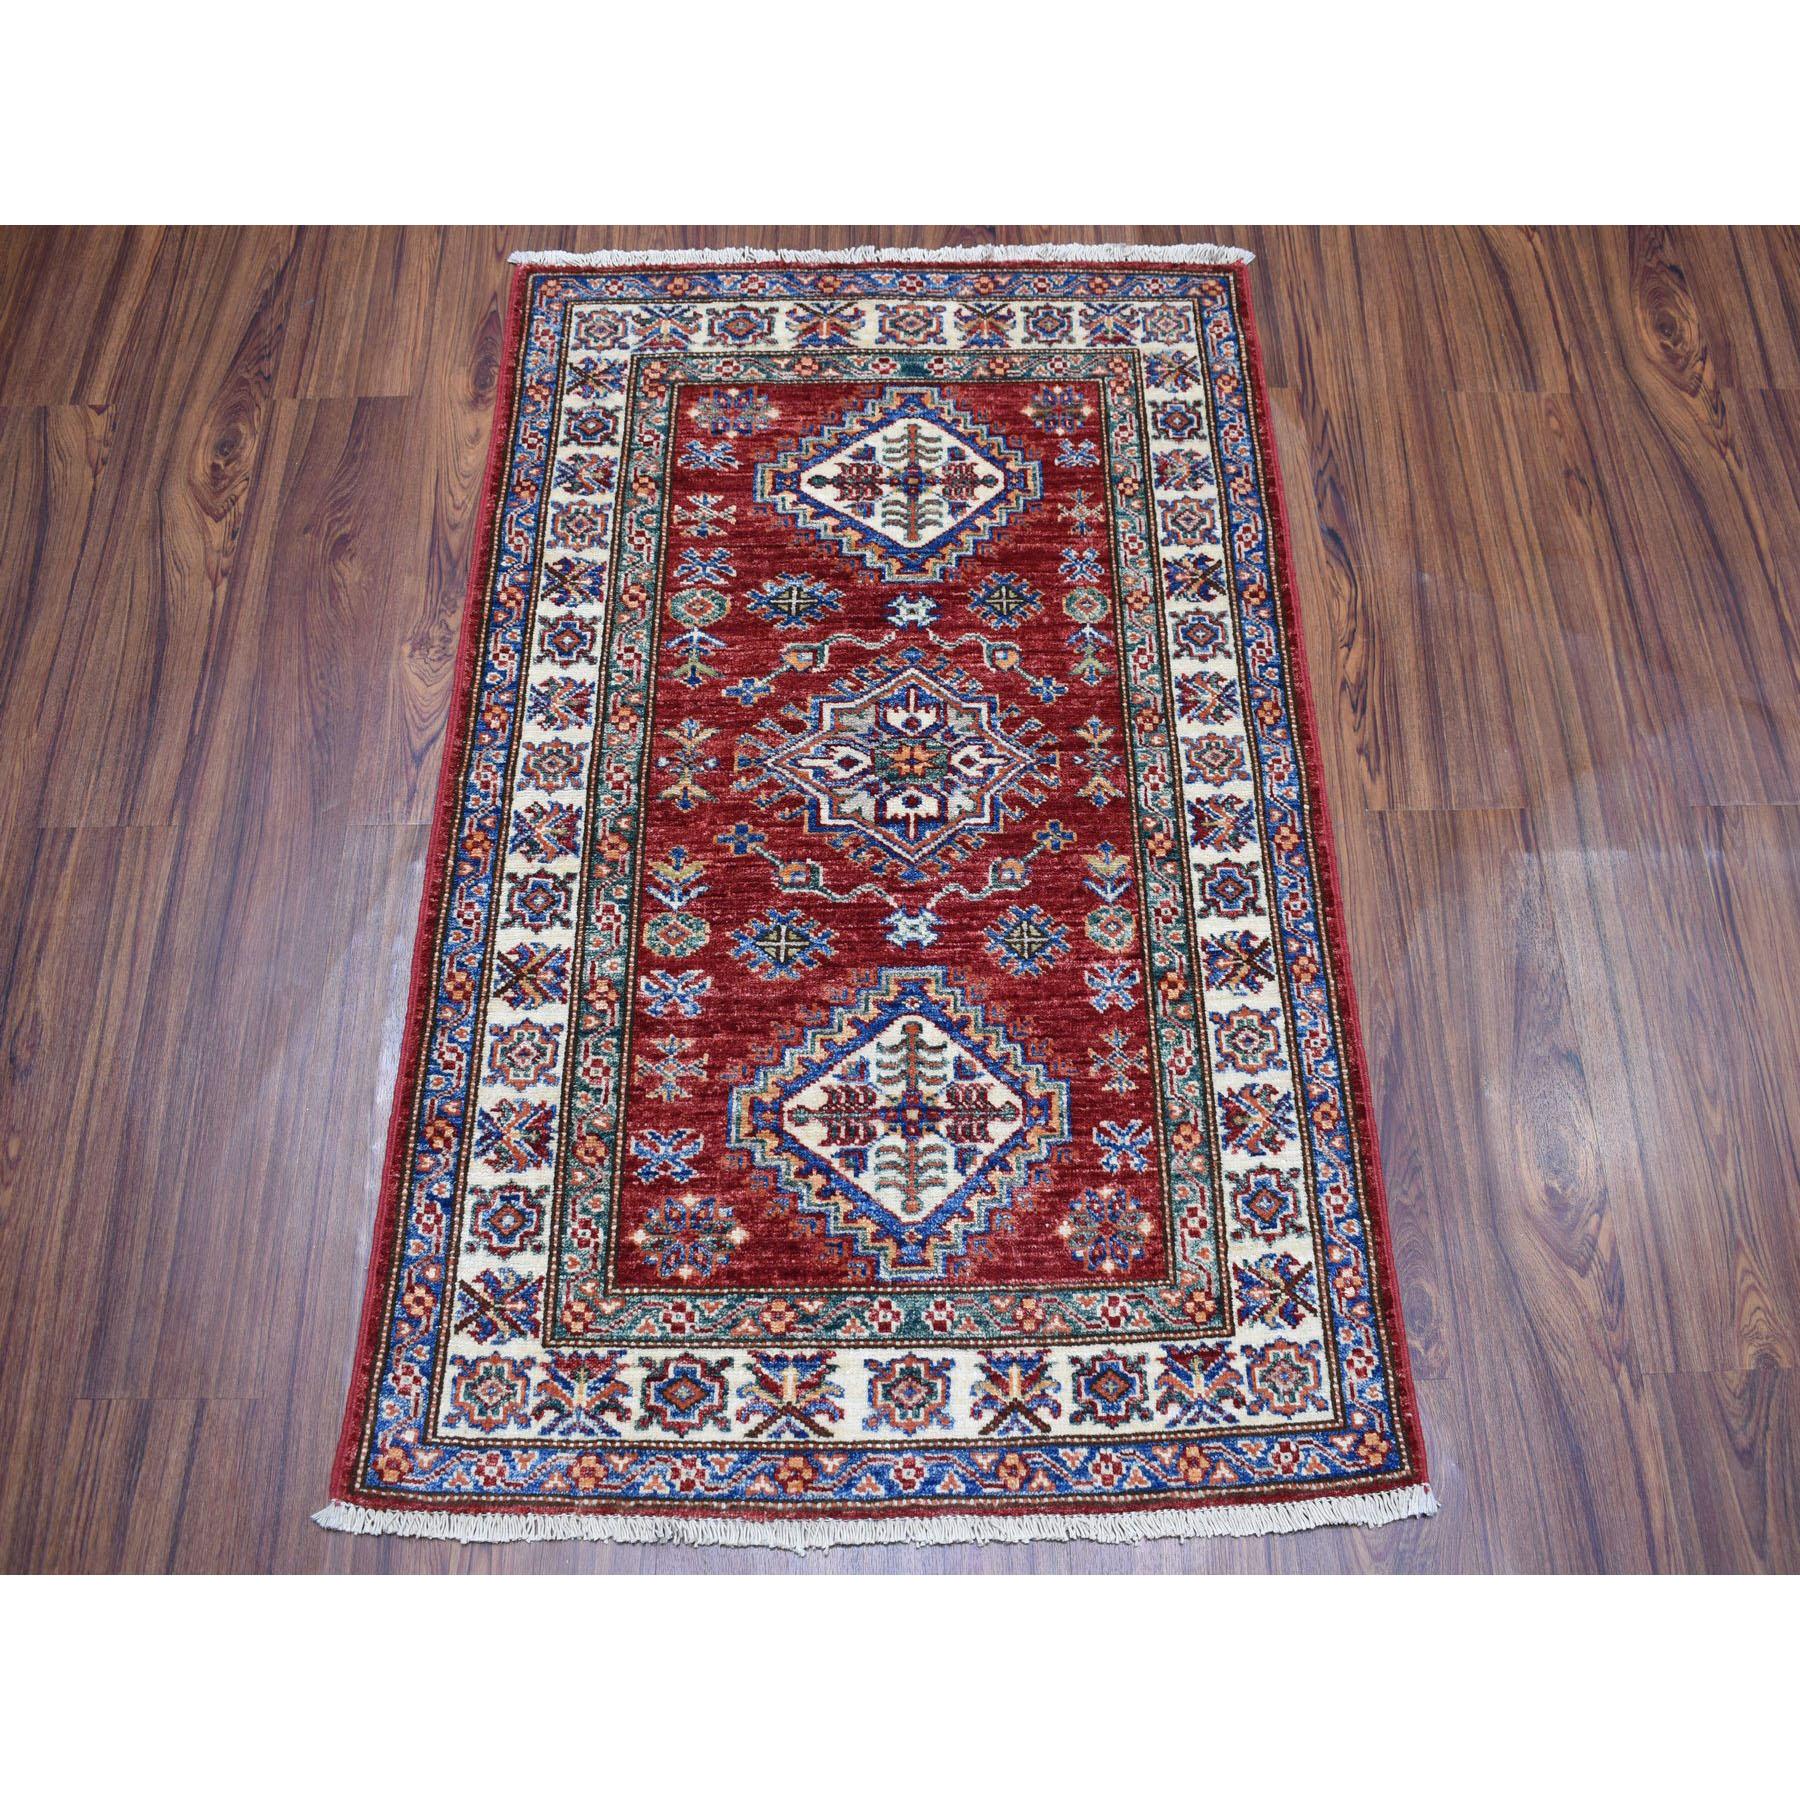 2-7 x3-9  Red Super Kazak Pure Wool Geometric Design Hand-Knotted Oriental Rug